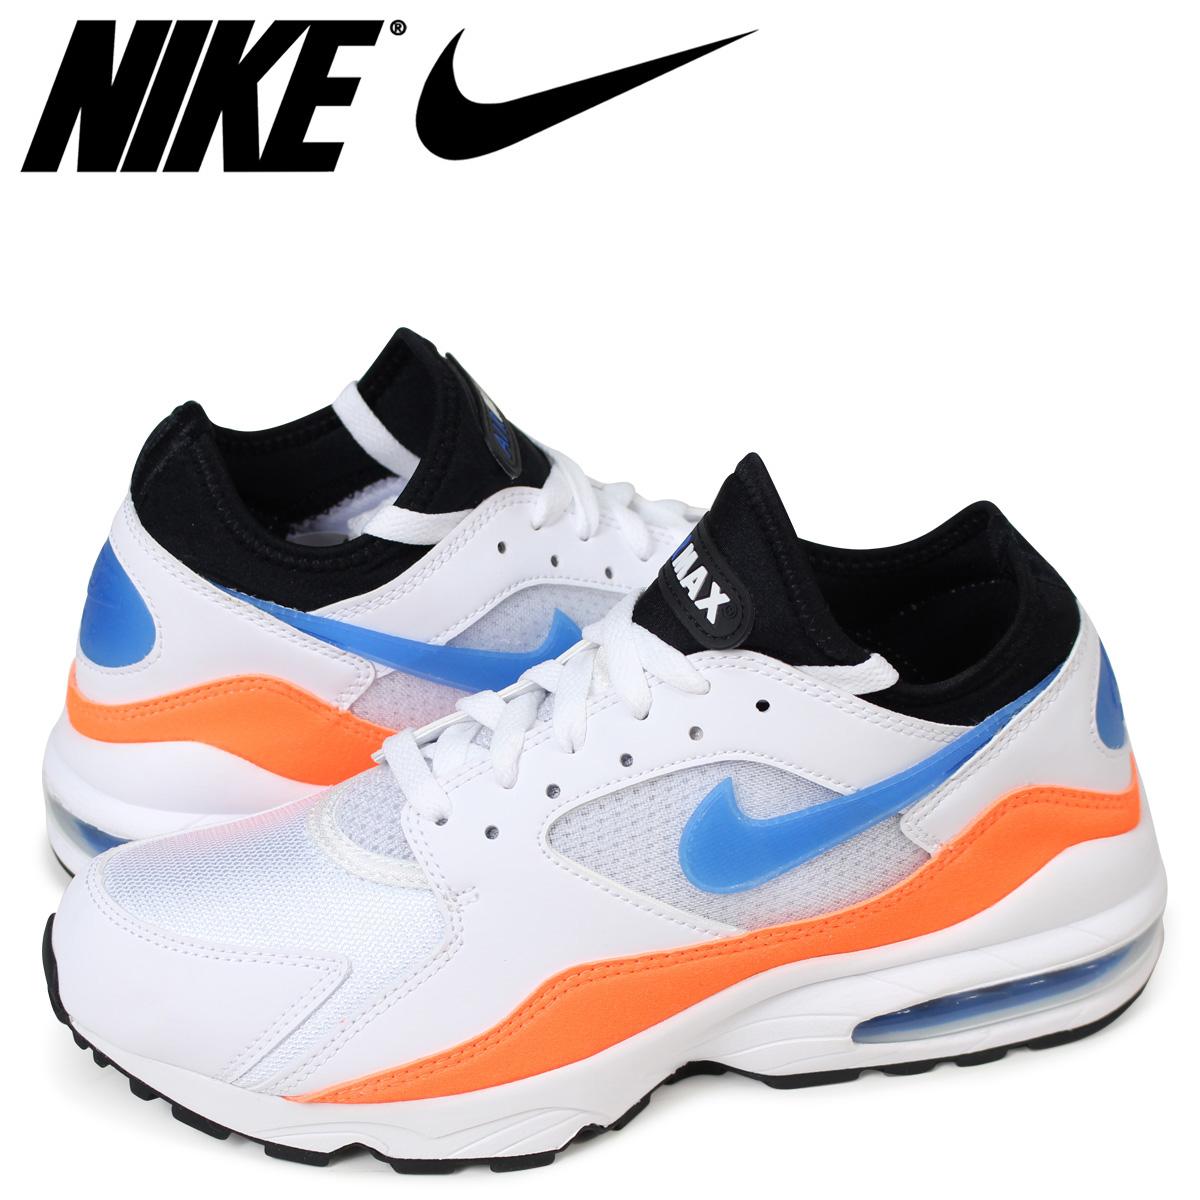 new styles fac12 0e764 Nike NIKE Air Max 93 sneakers men AIR MAX 93 306,551-104 white ...